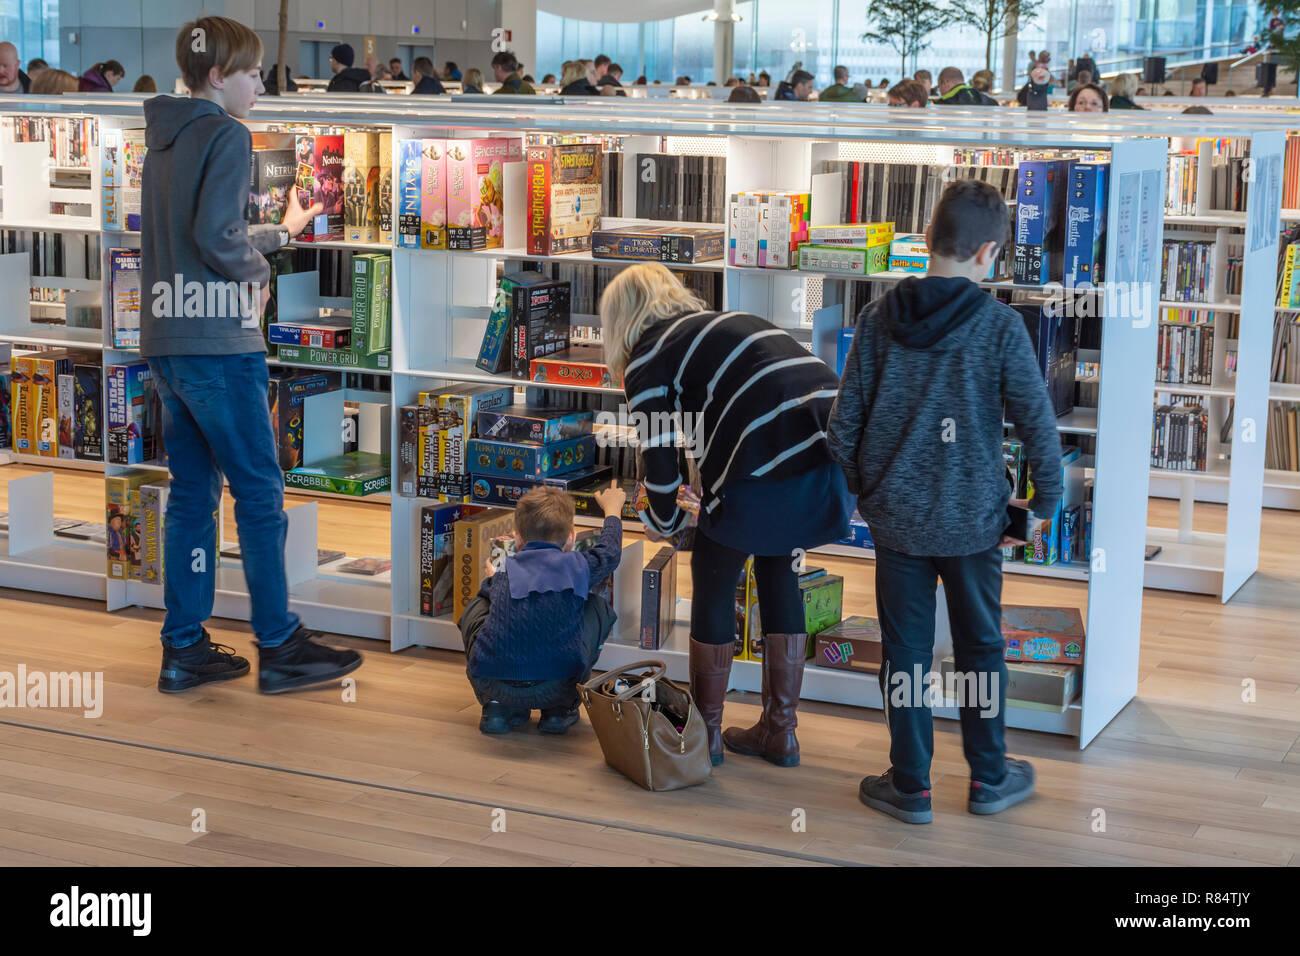 family-at-oodi-central-library-book-shelves-in-helsinki-finland-R84TJY.jpg